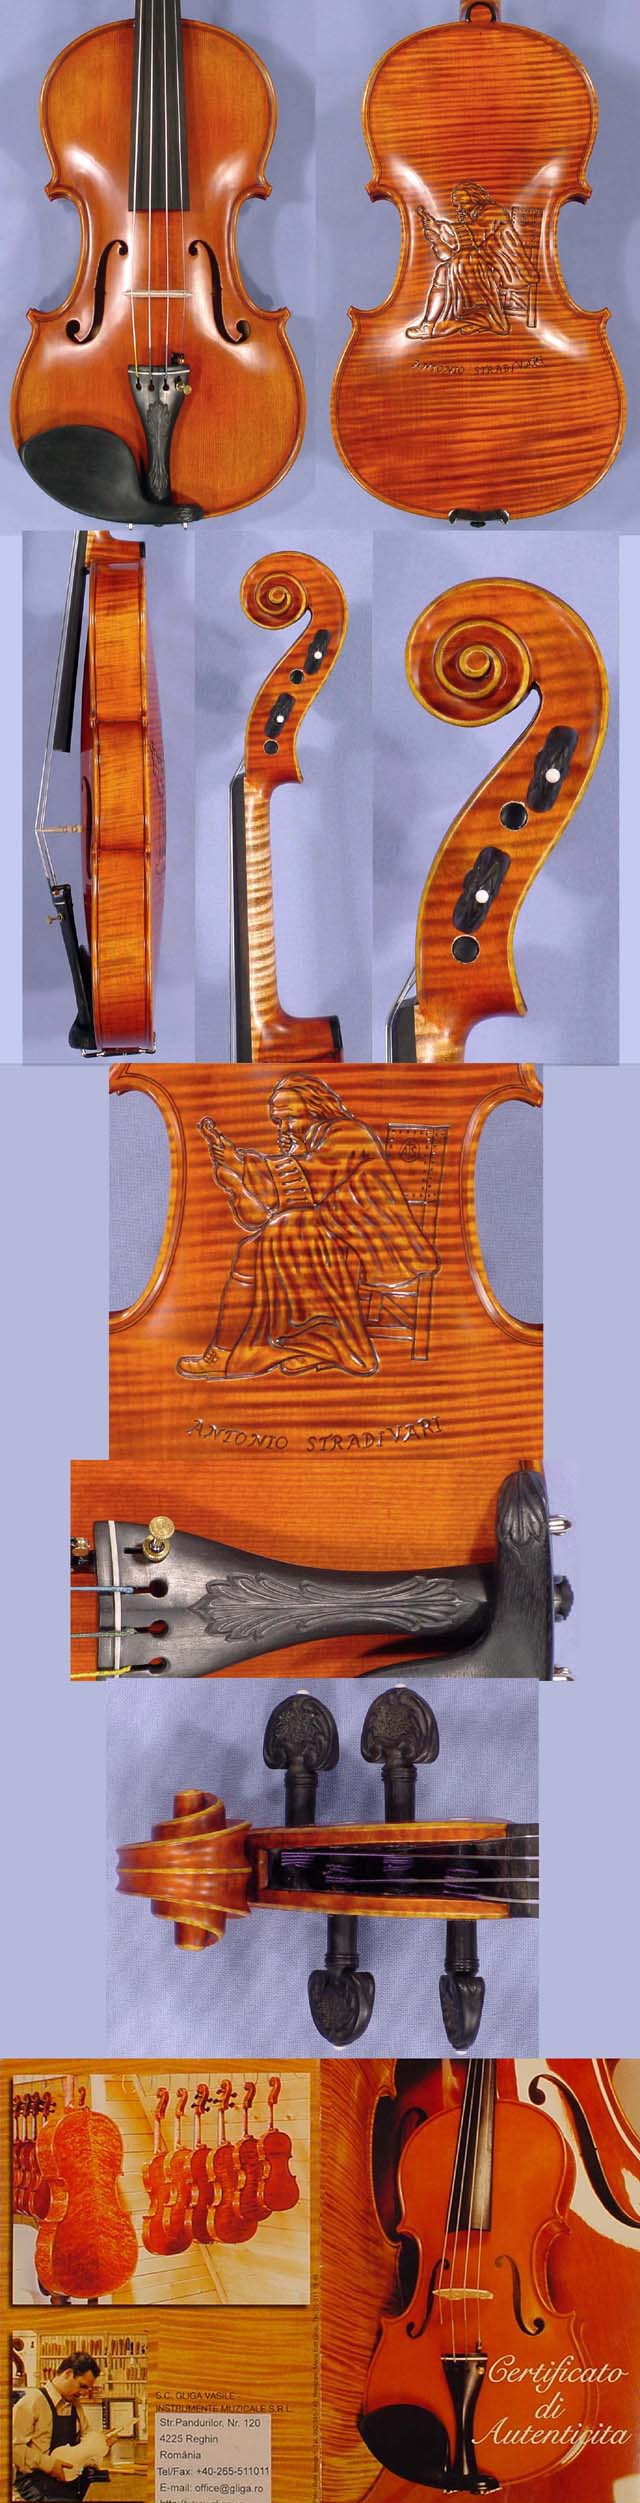 4/4 MAESTRO VASILE GLIGA One Piece Back Violin